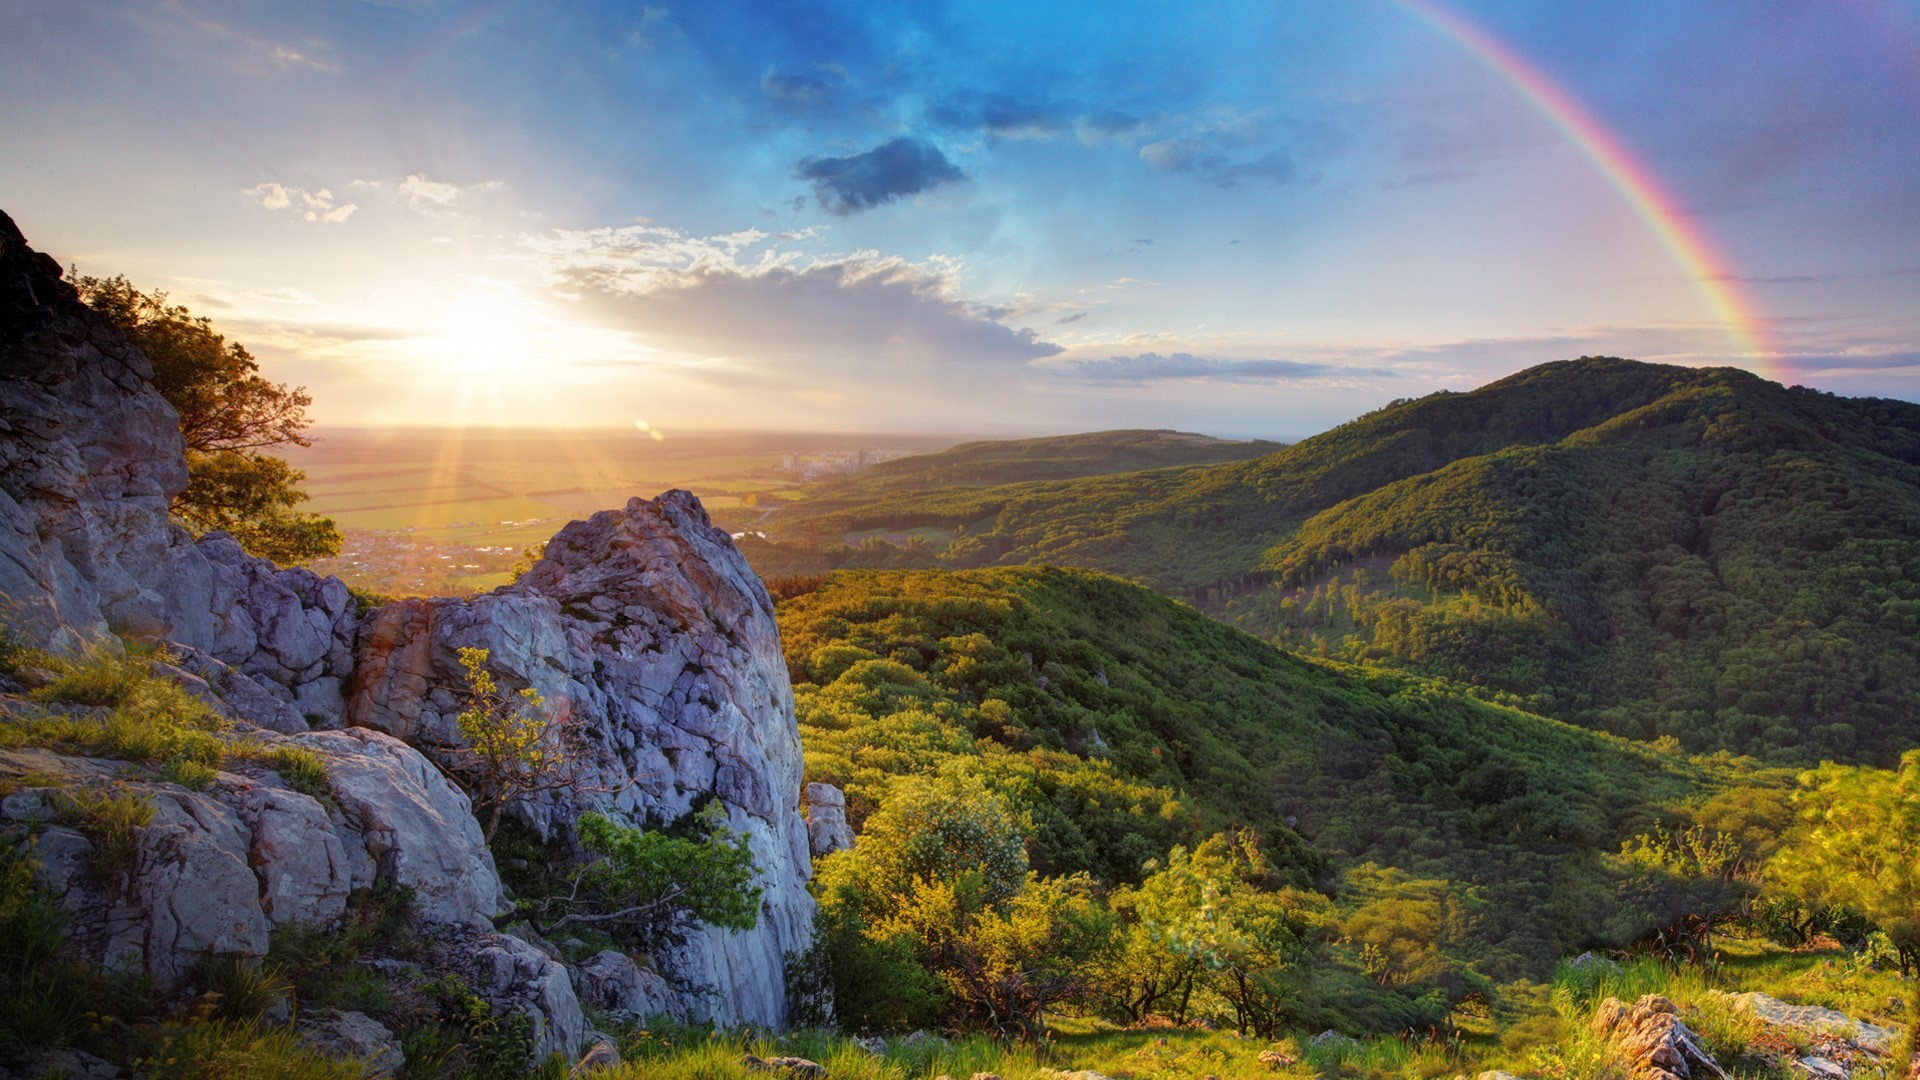 Green mountain sunset with sun and rainbow, Iceland | Windows 10 ...